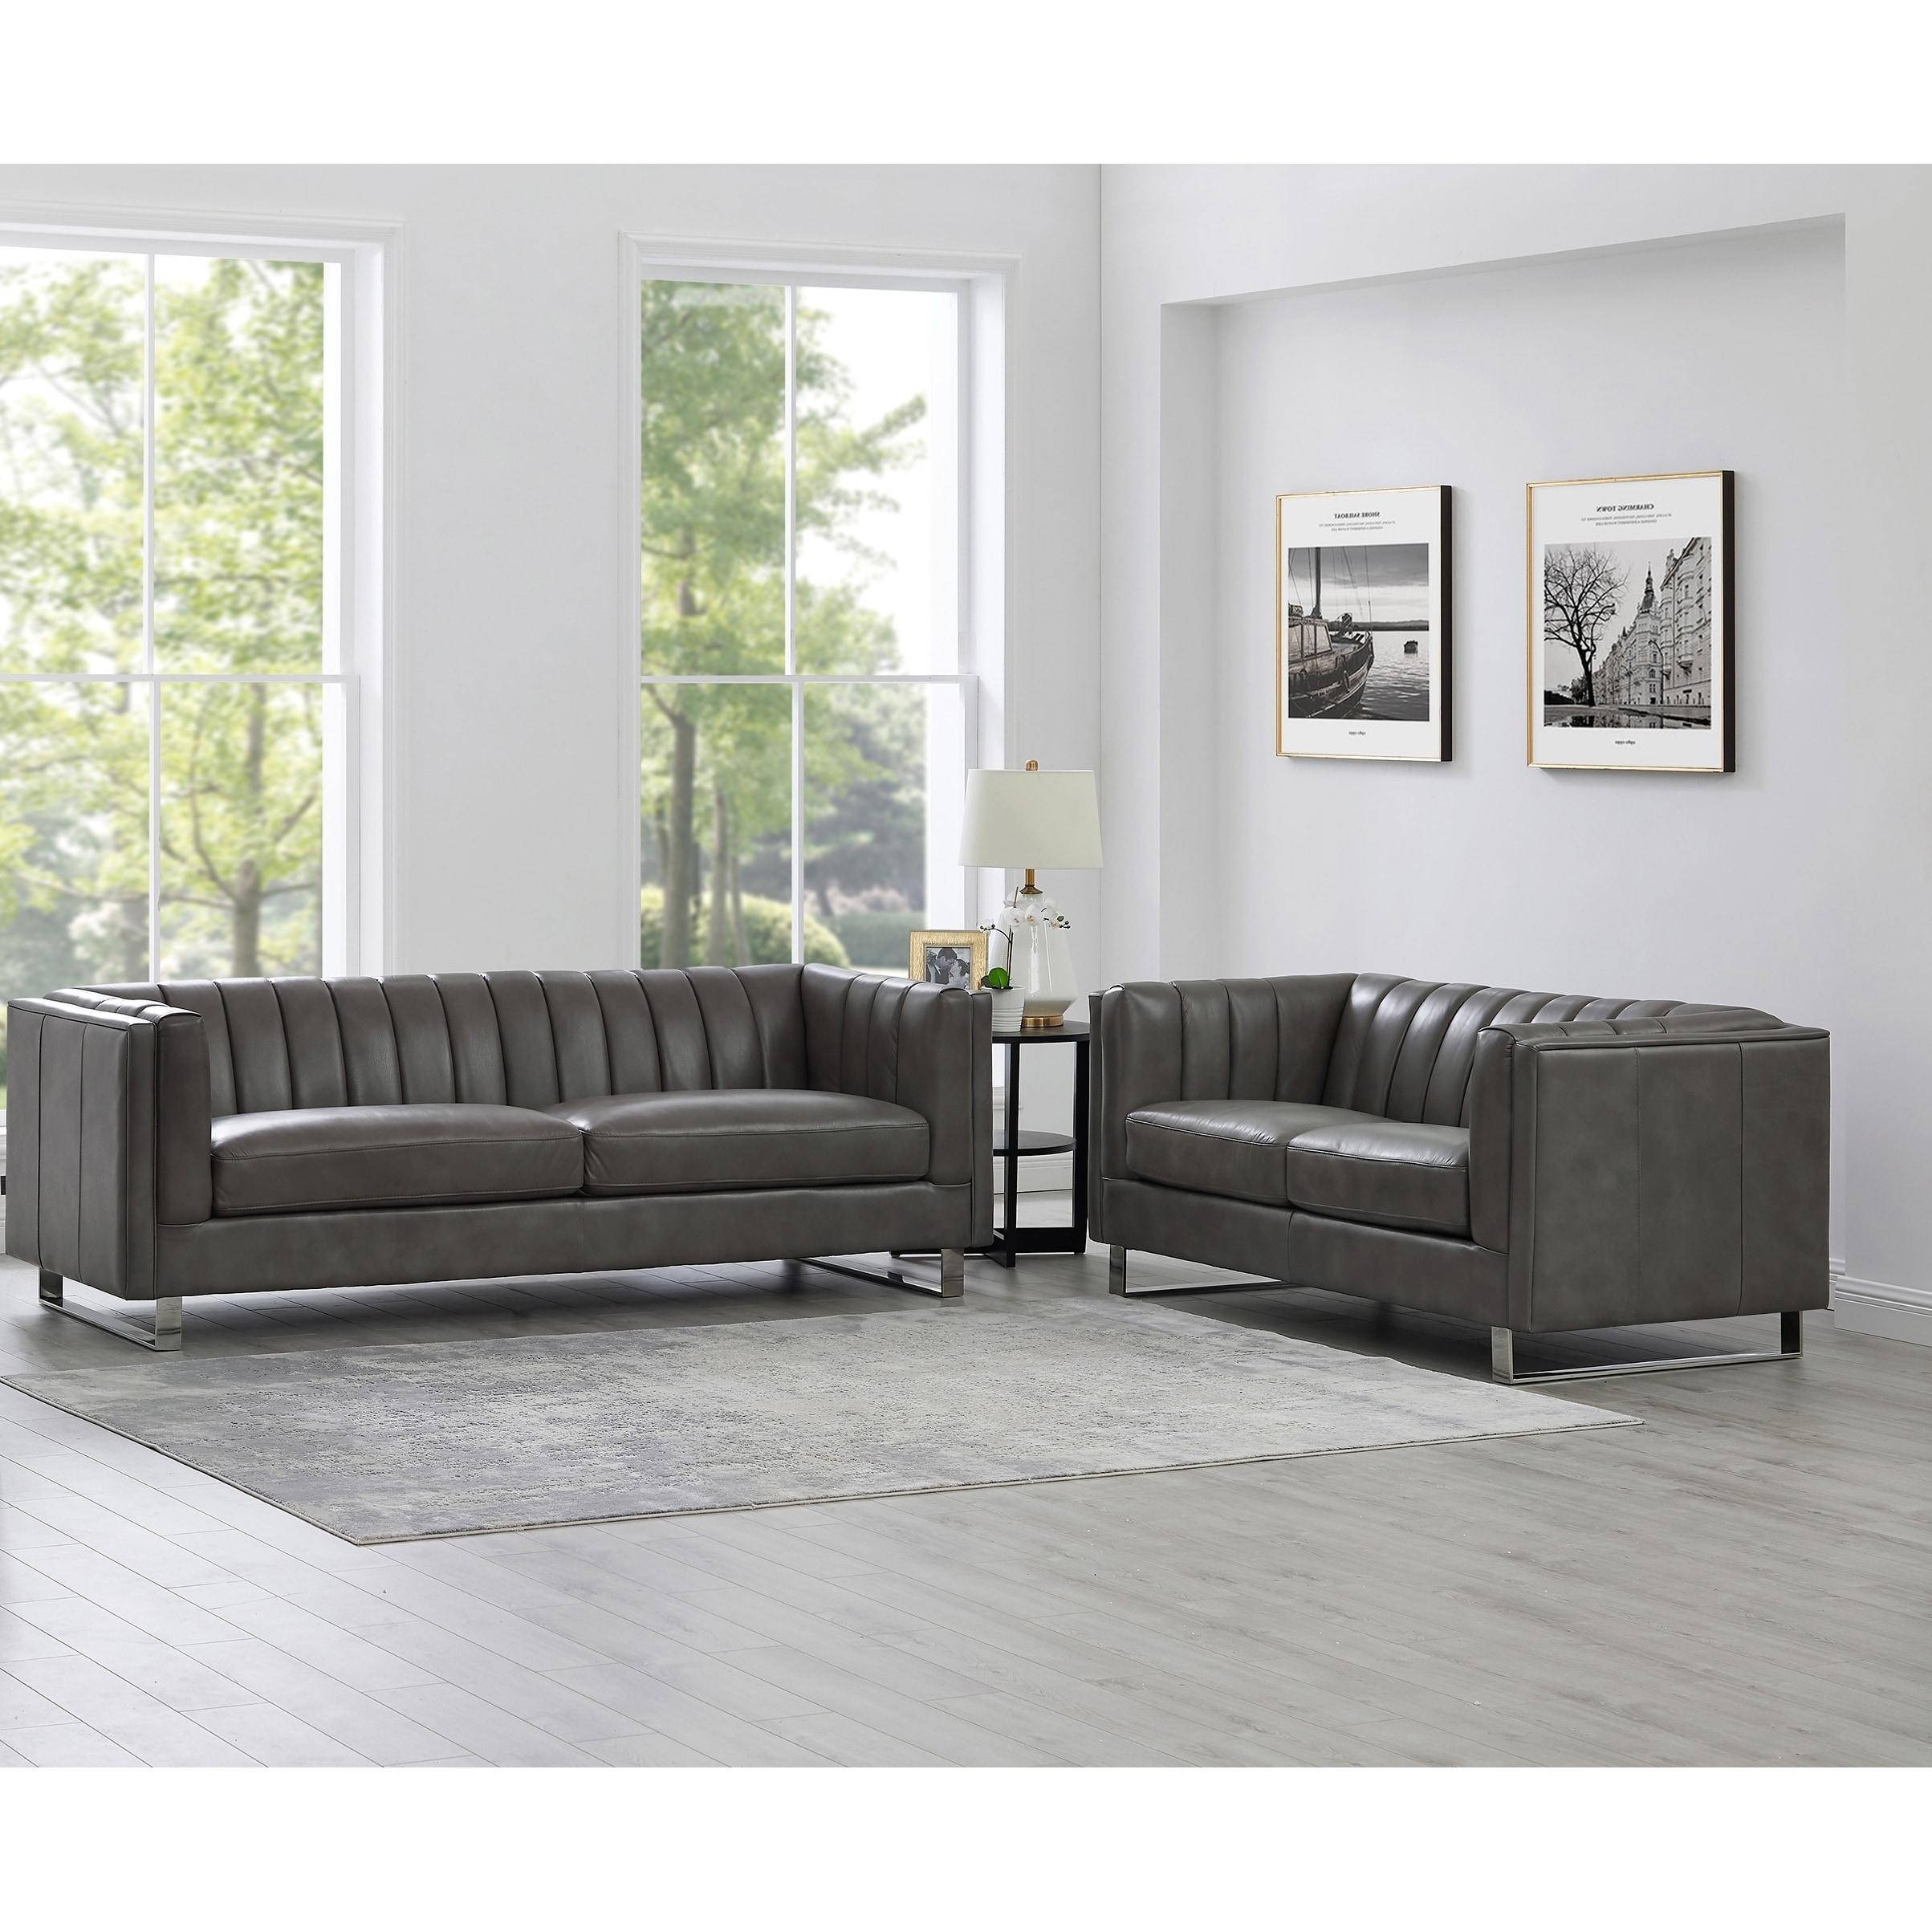 Genuine Leather Sofa And Loveseat Set